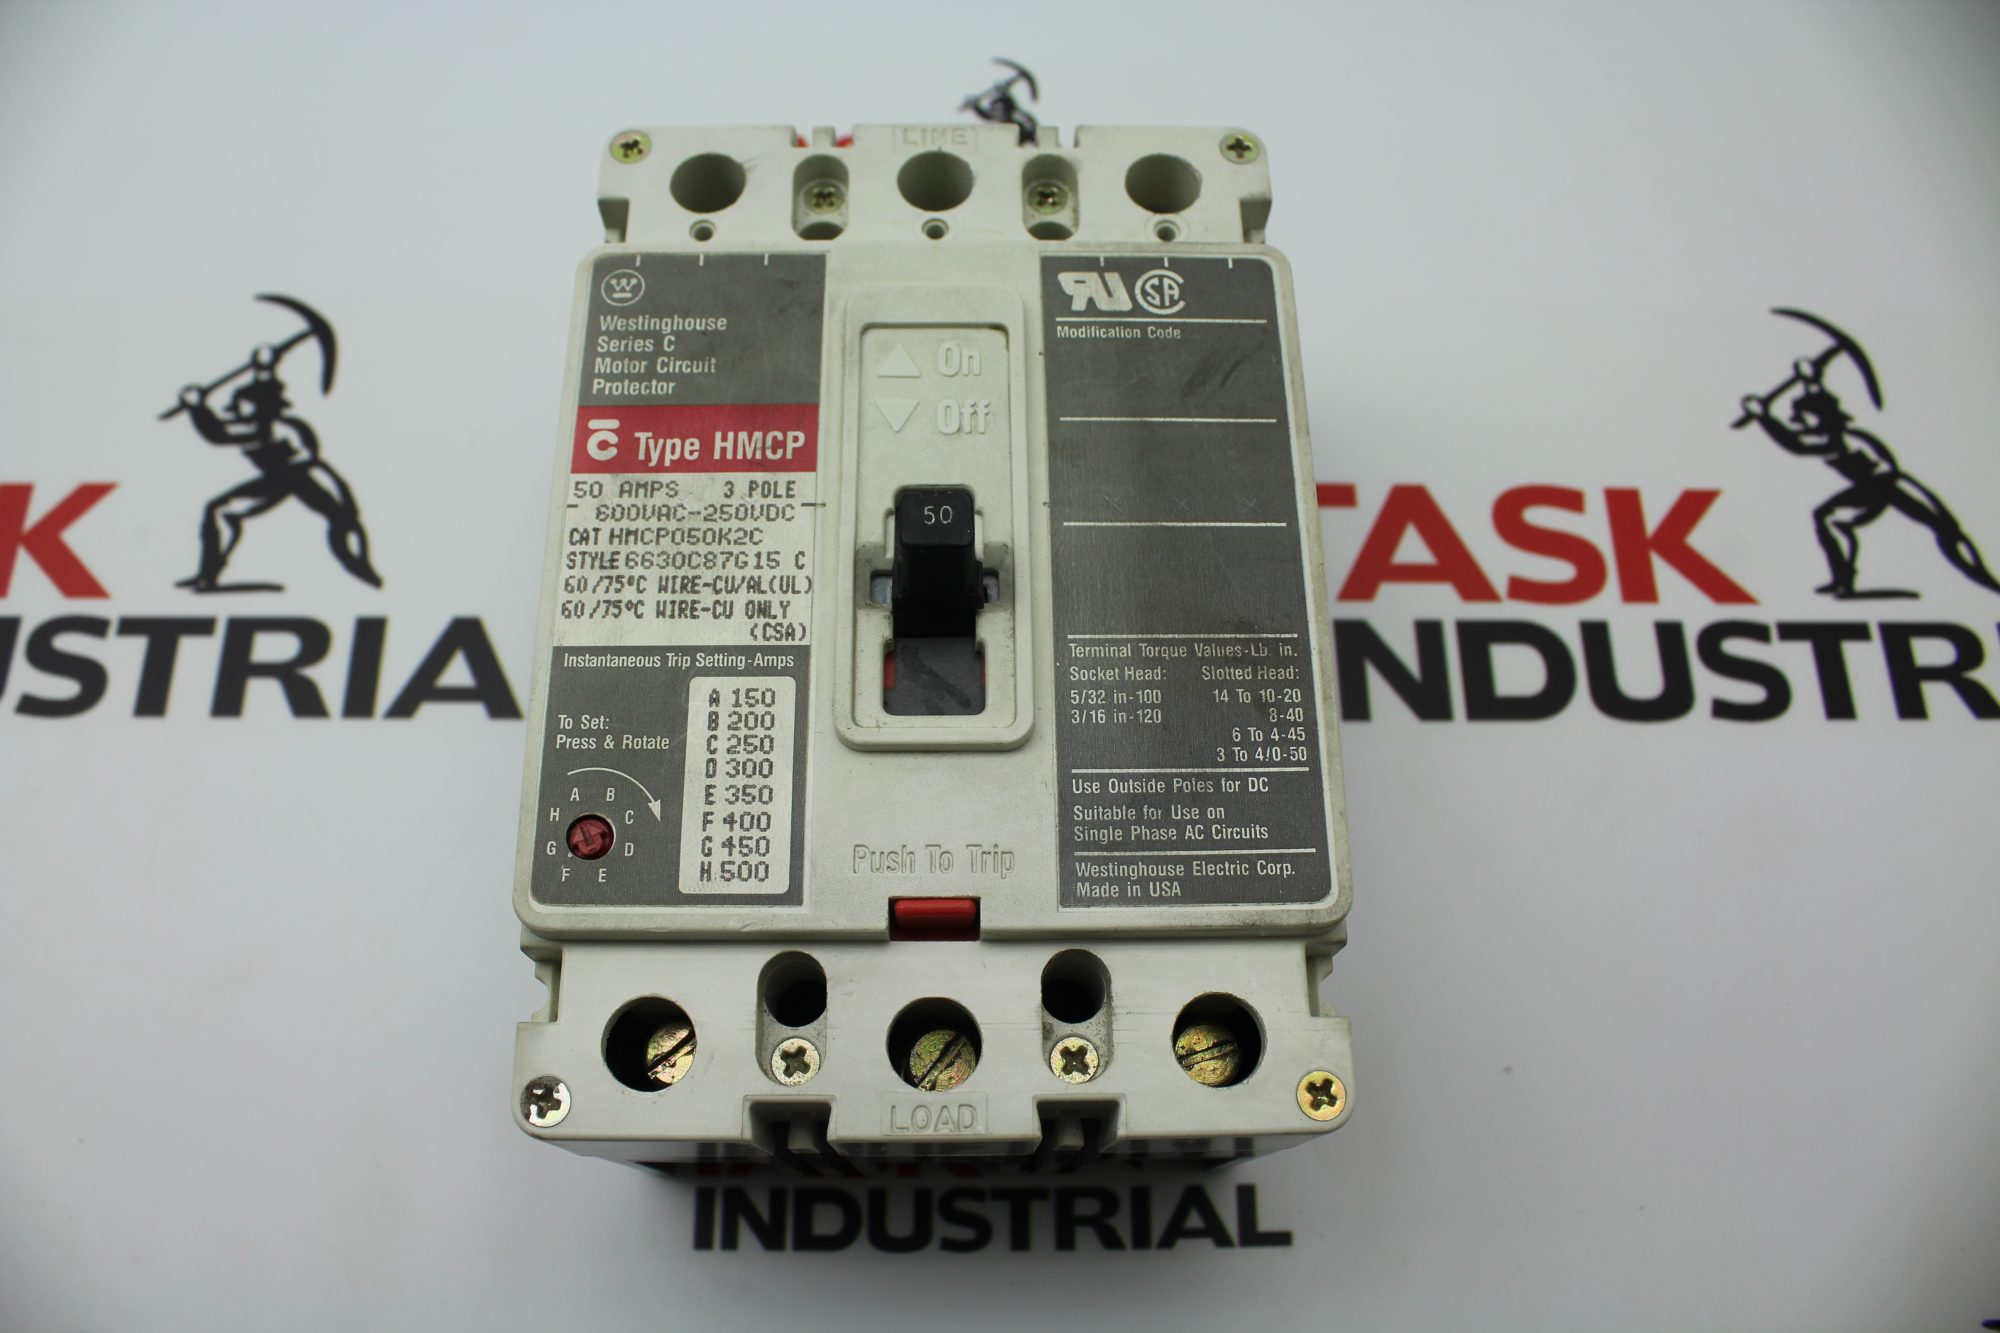 Electrical Breakers Archives Task Surplus Details About Siemens 5sx21 C5 230 400v 5 Amp Circuit Breaker Cutler Hammer Hmcp050k2c 3 Pole 50 600 Vac Motor Protector